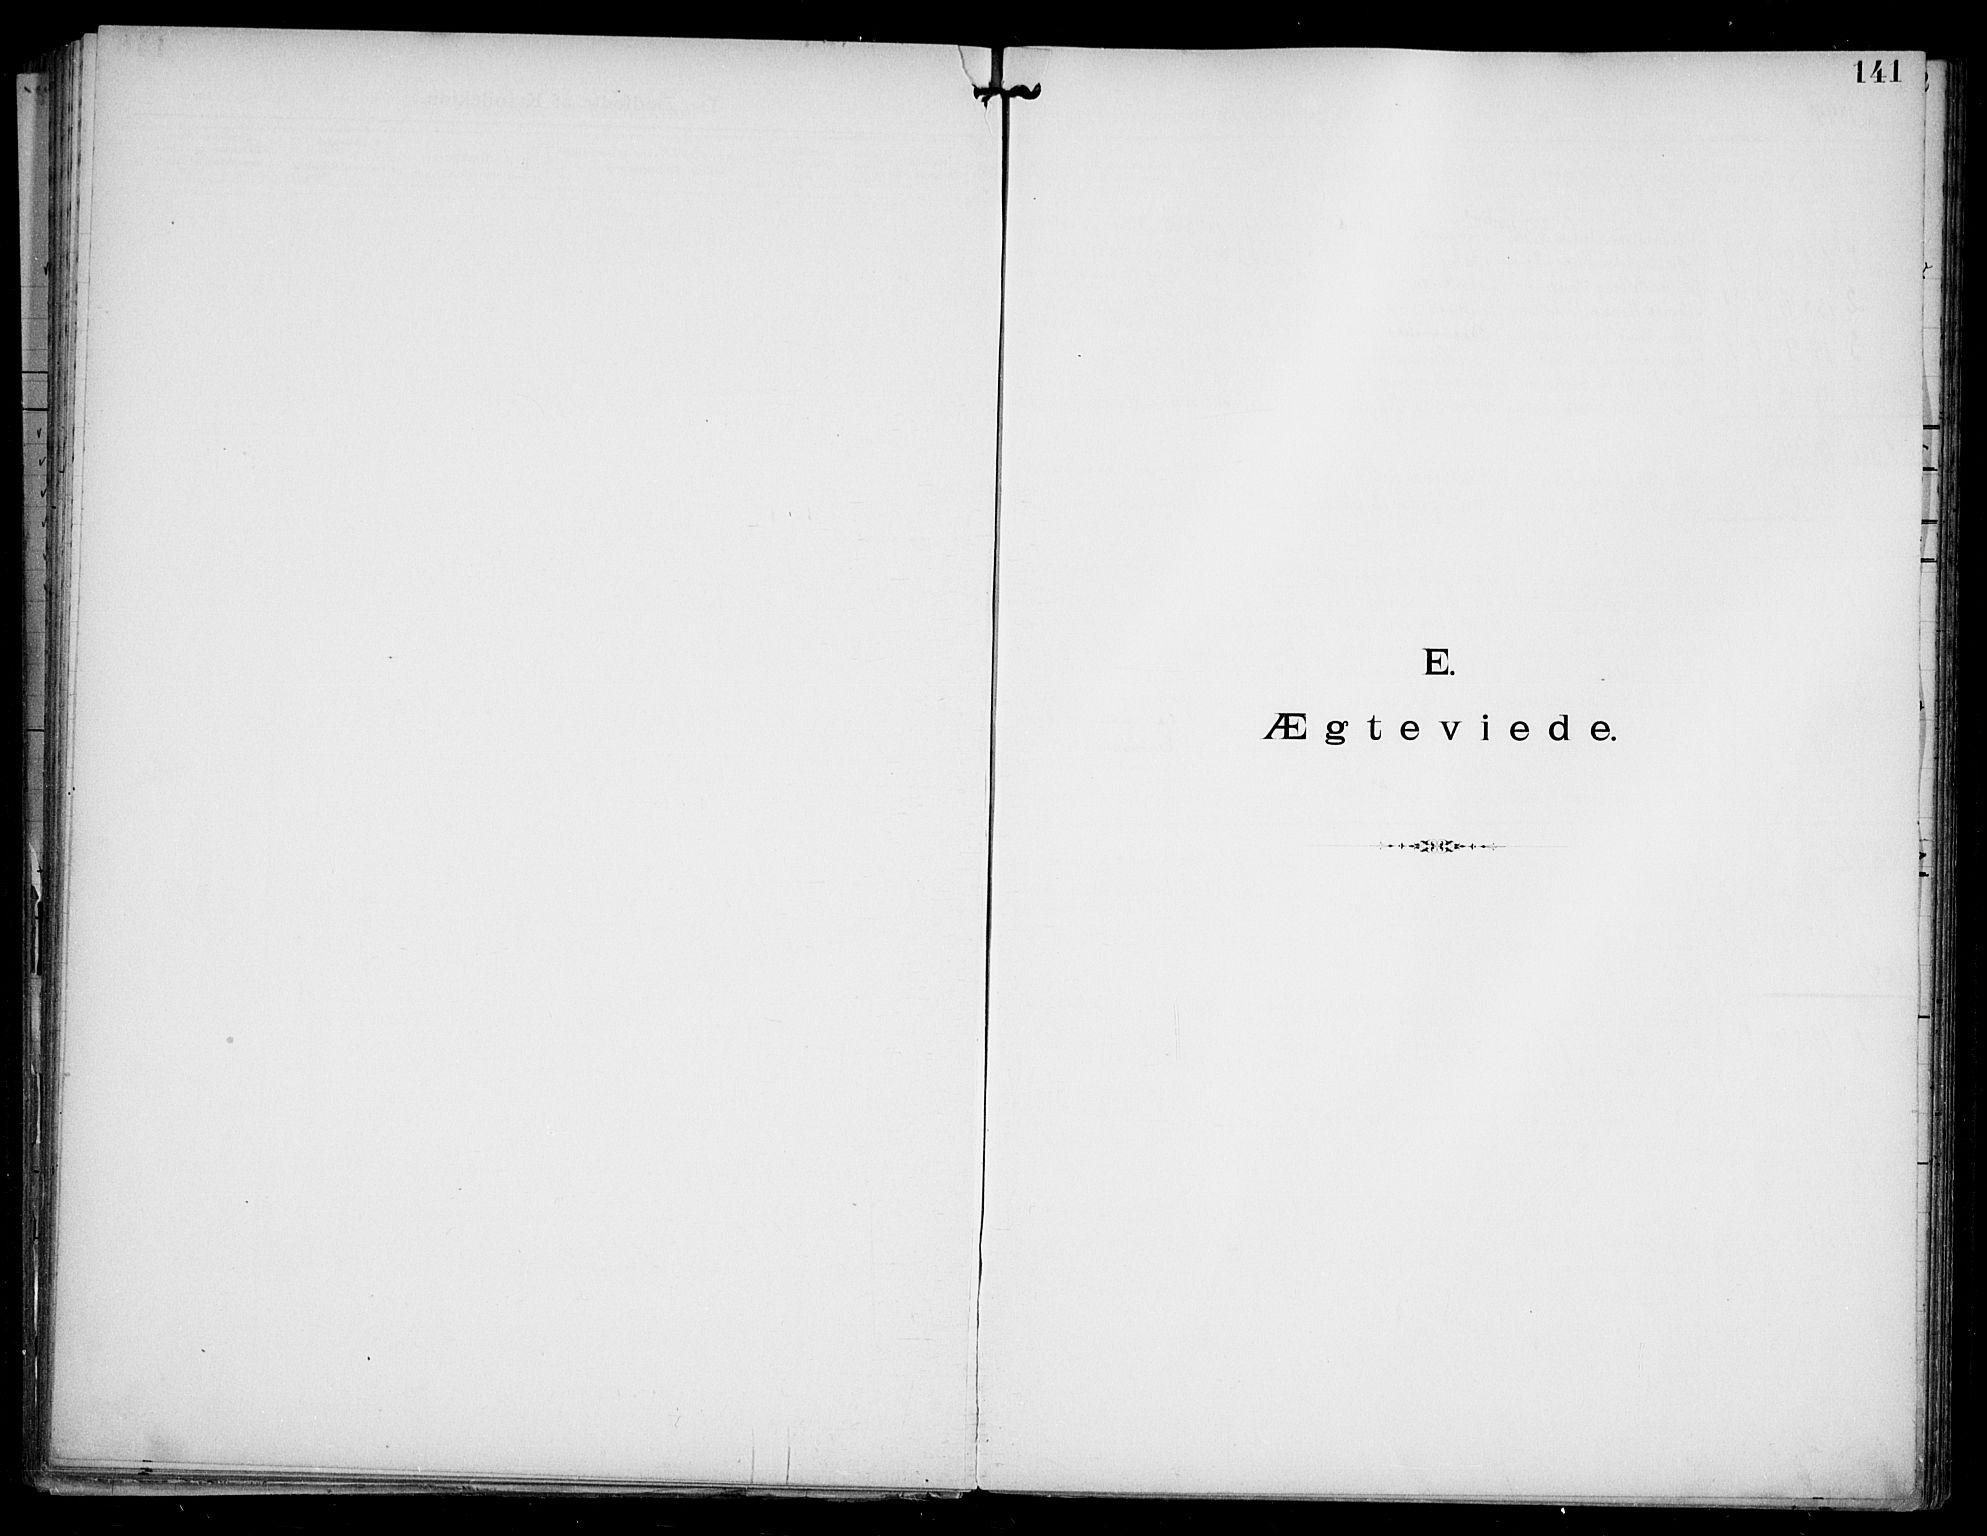 SAO, Den katolsk apostoliske menighet i Oslo , F/Fa/L0002: Dissenterprotokoll nr. 2, 1892-1937, s. 141